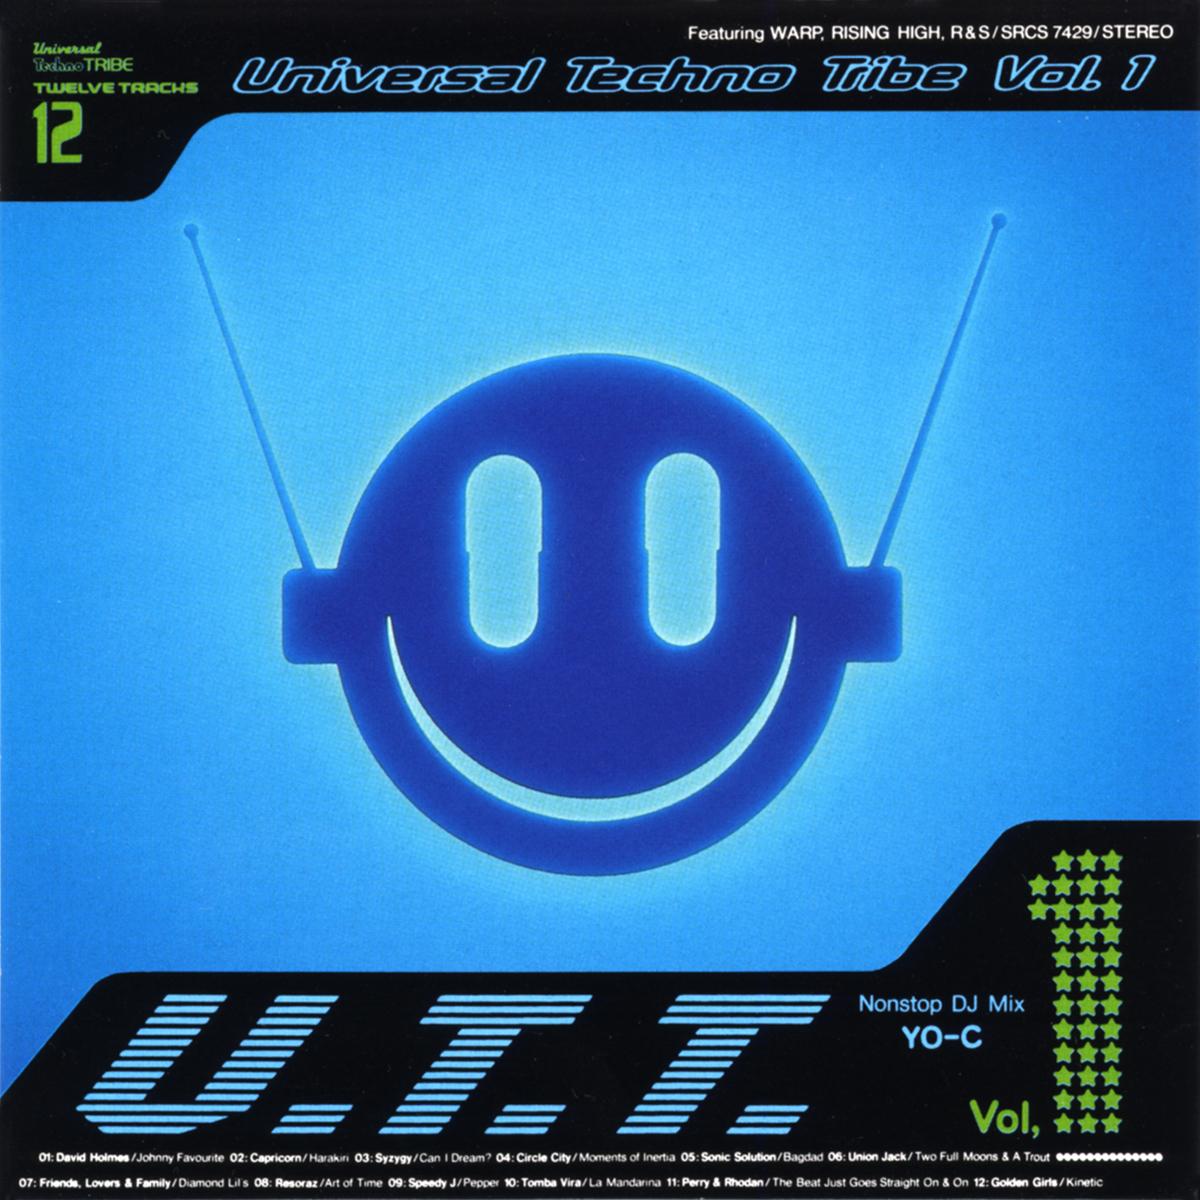 "V.A. Mix by YO-C ""Universal Techno Tribe Voi.1"""